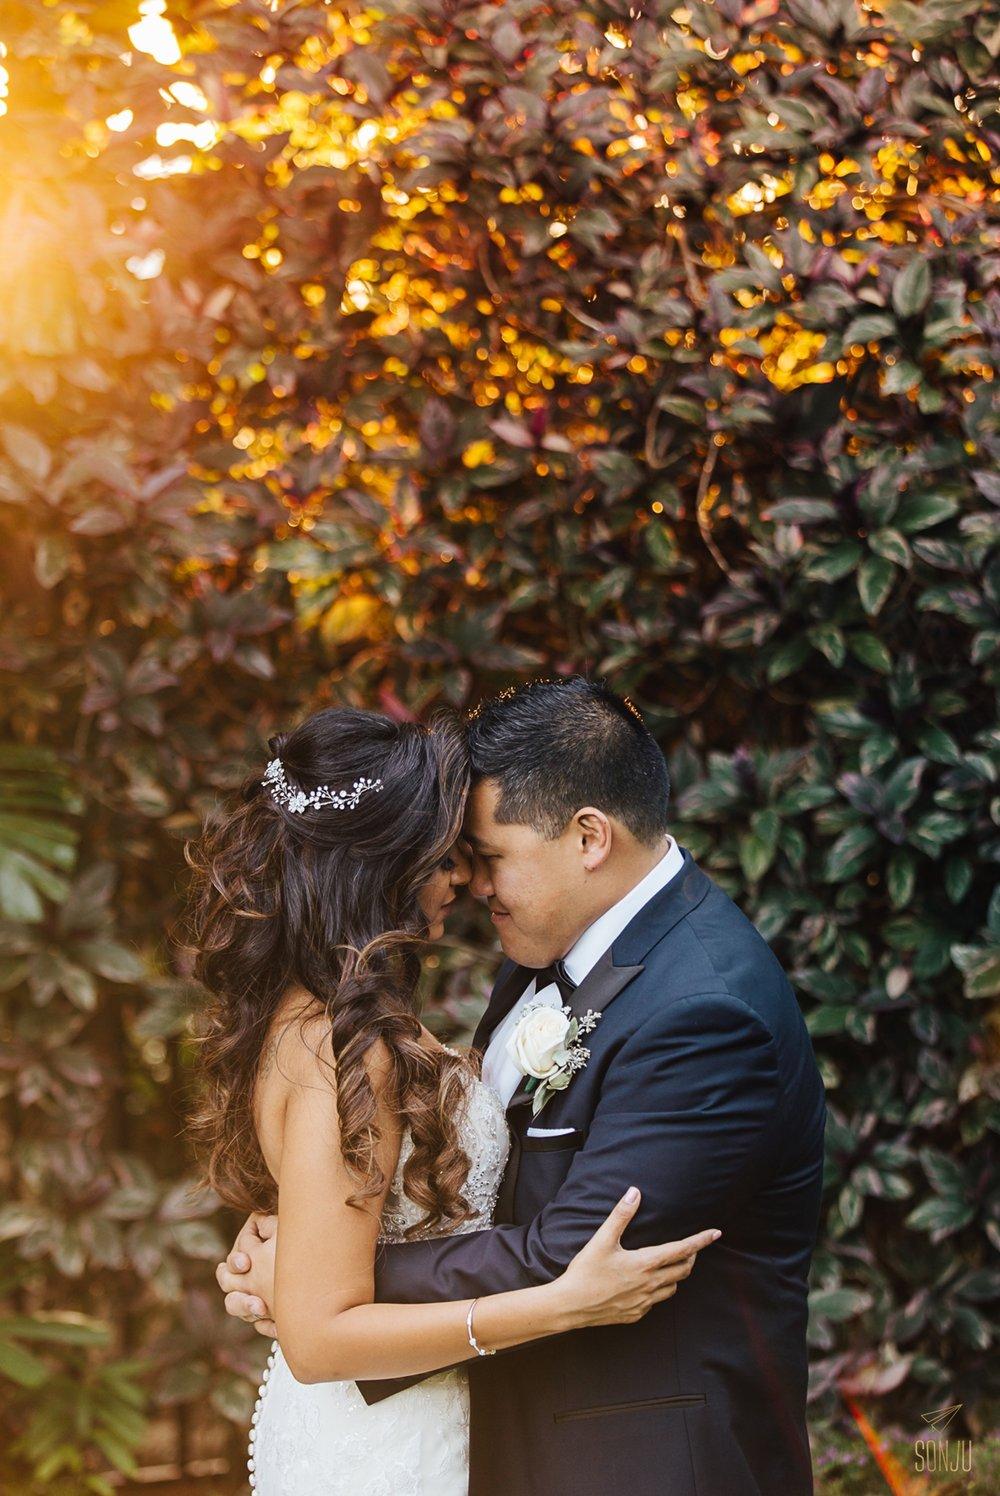 Miami-Beach-Botanical-Gardens-Wedding-Photographer-Maansi-Marcus-Sonju00033.jpg